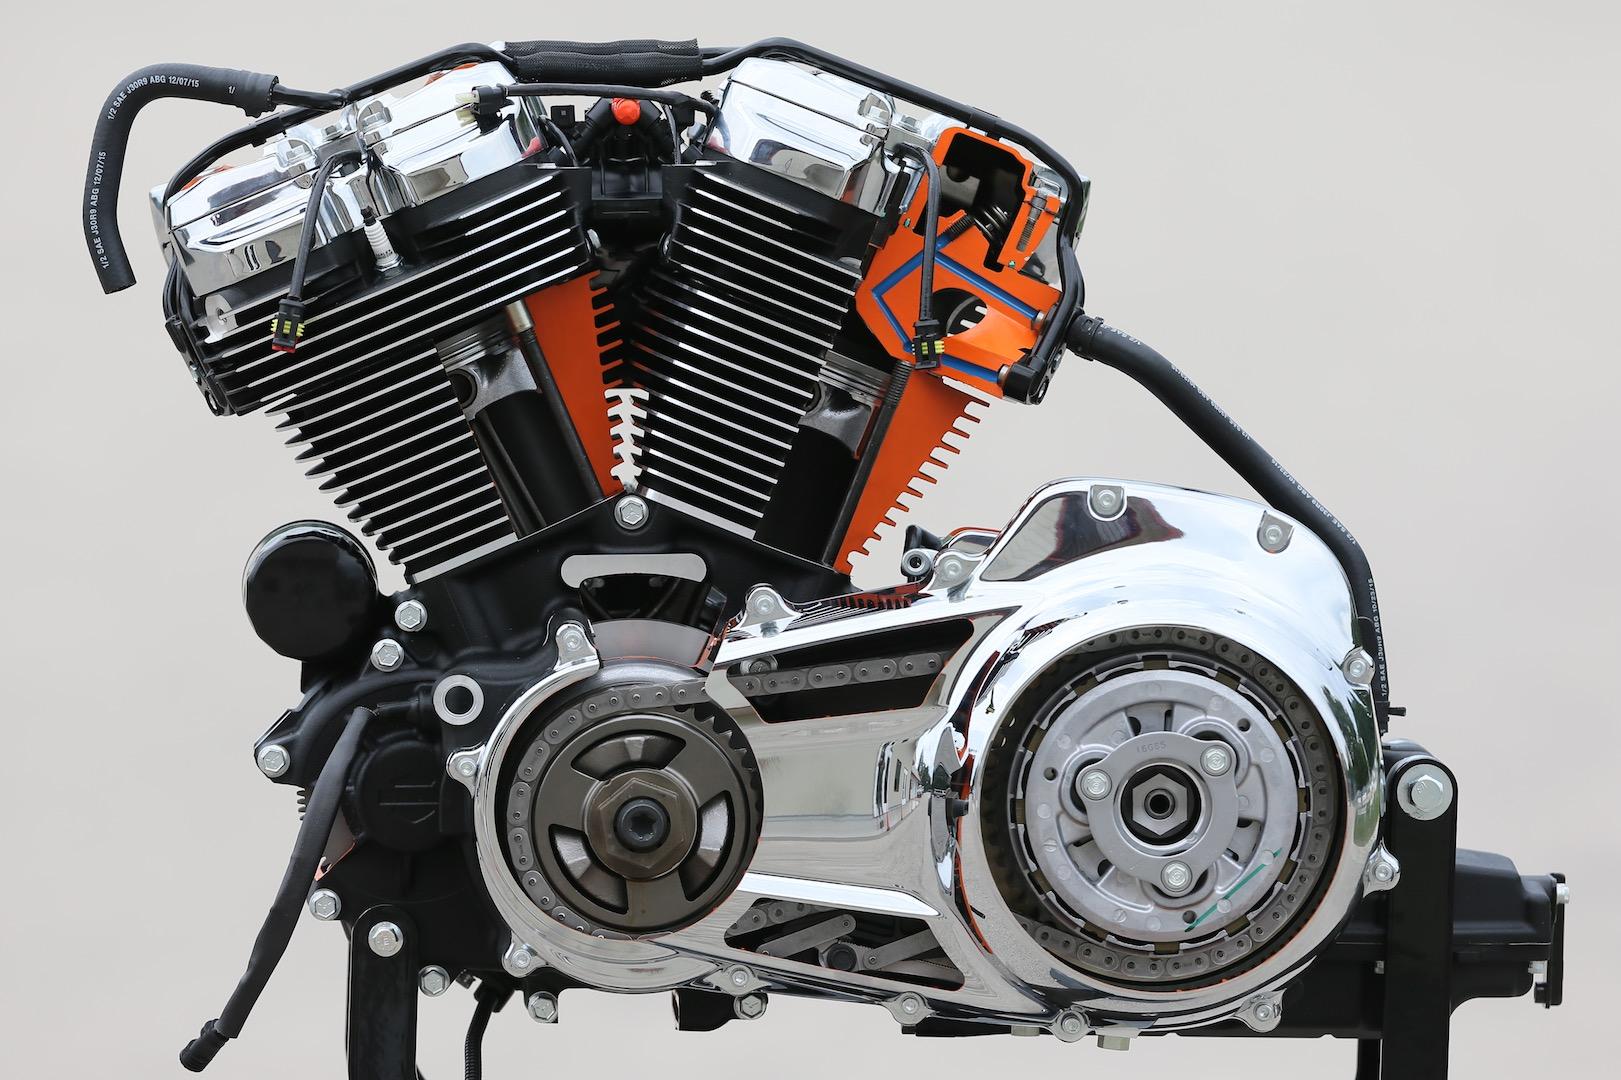 Awe Inspiring Harley Twin Cam Engine Diagram Basic Electronics Wiring Diagram Wiring Cloud Waroletkolfr09Org